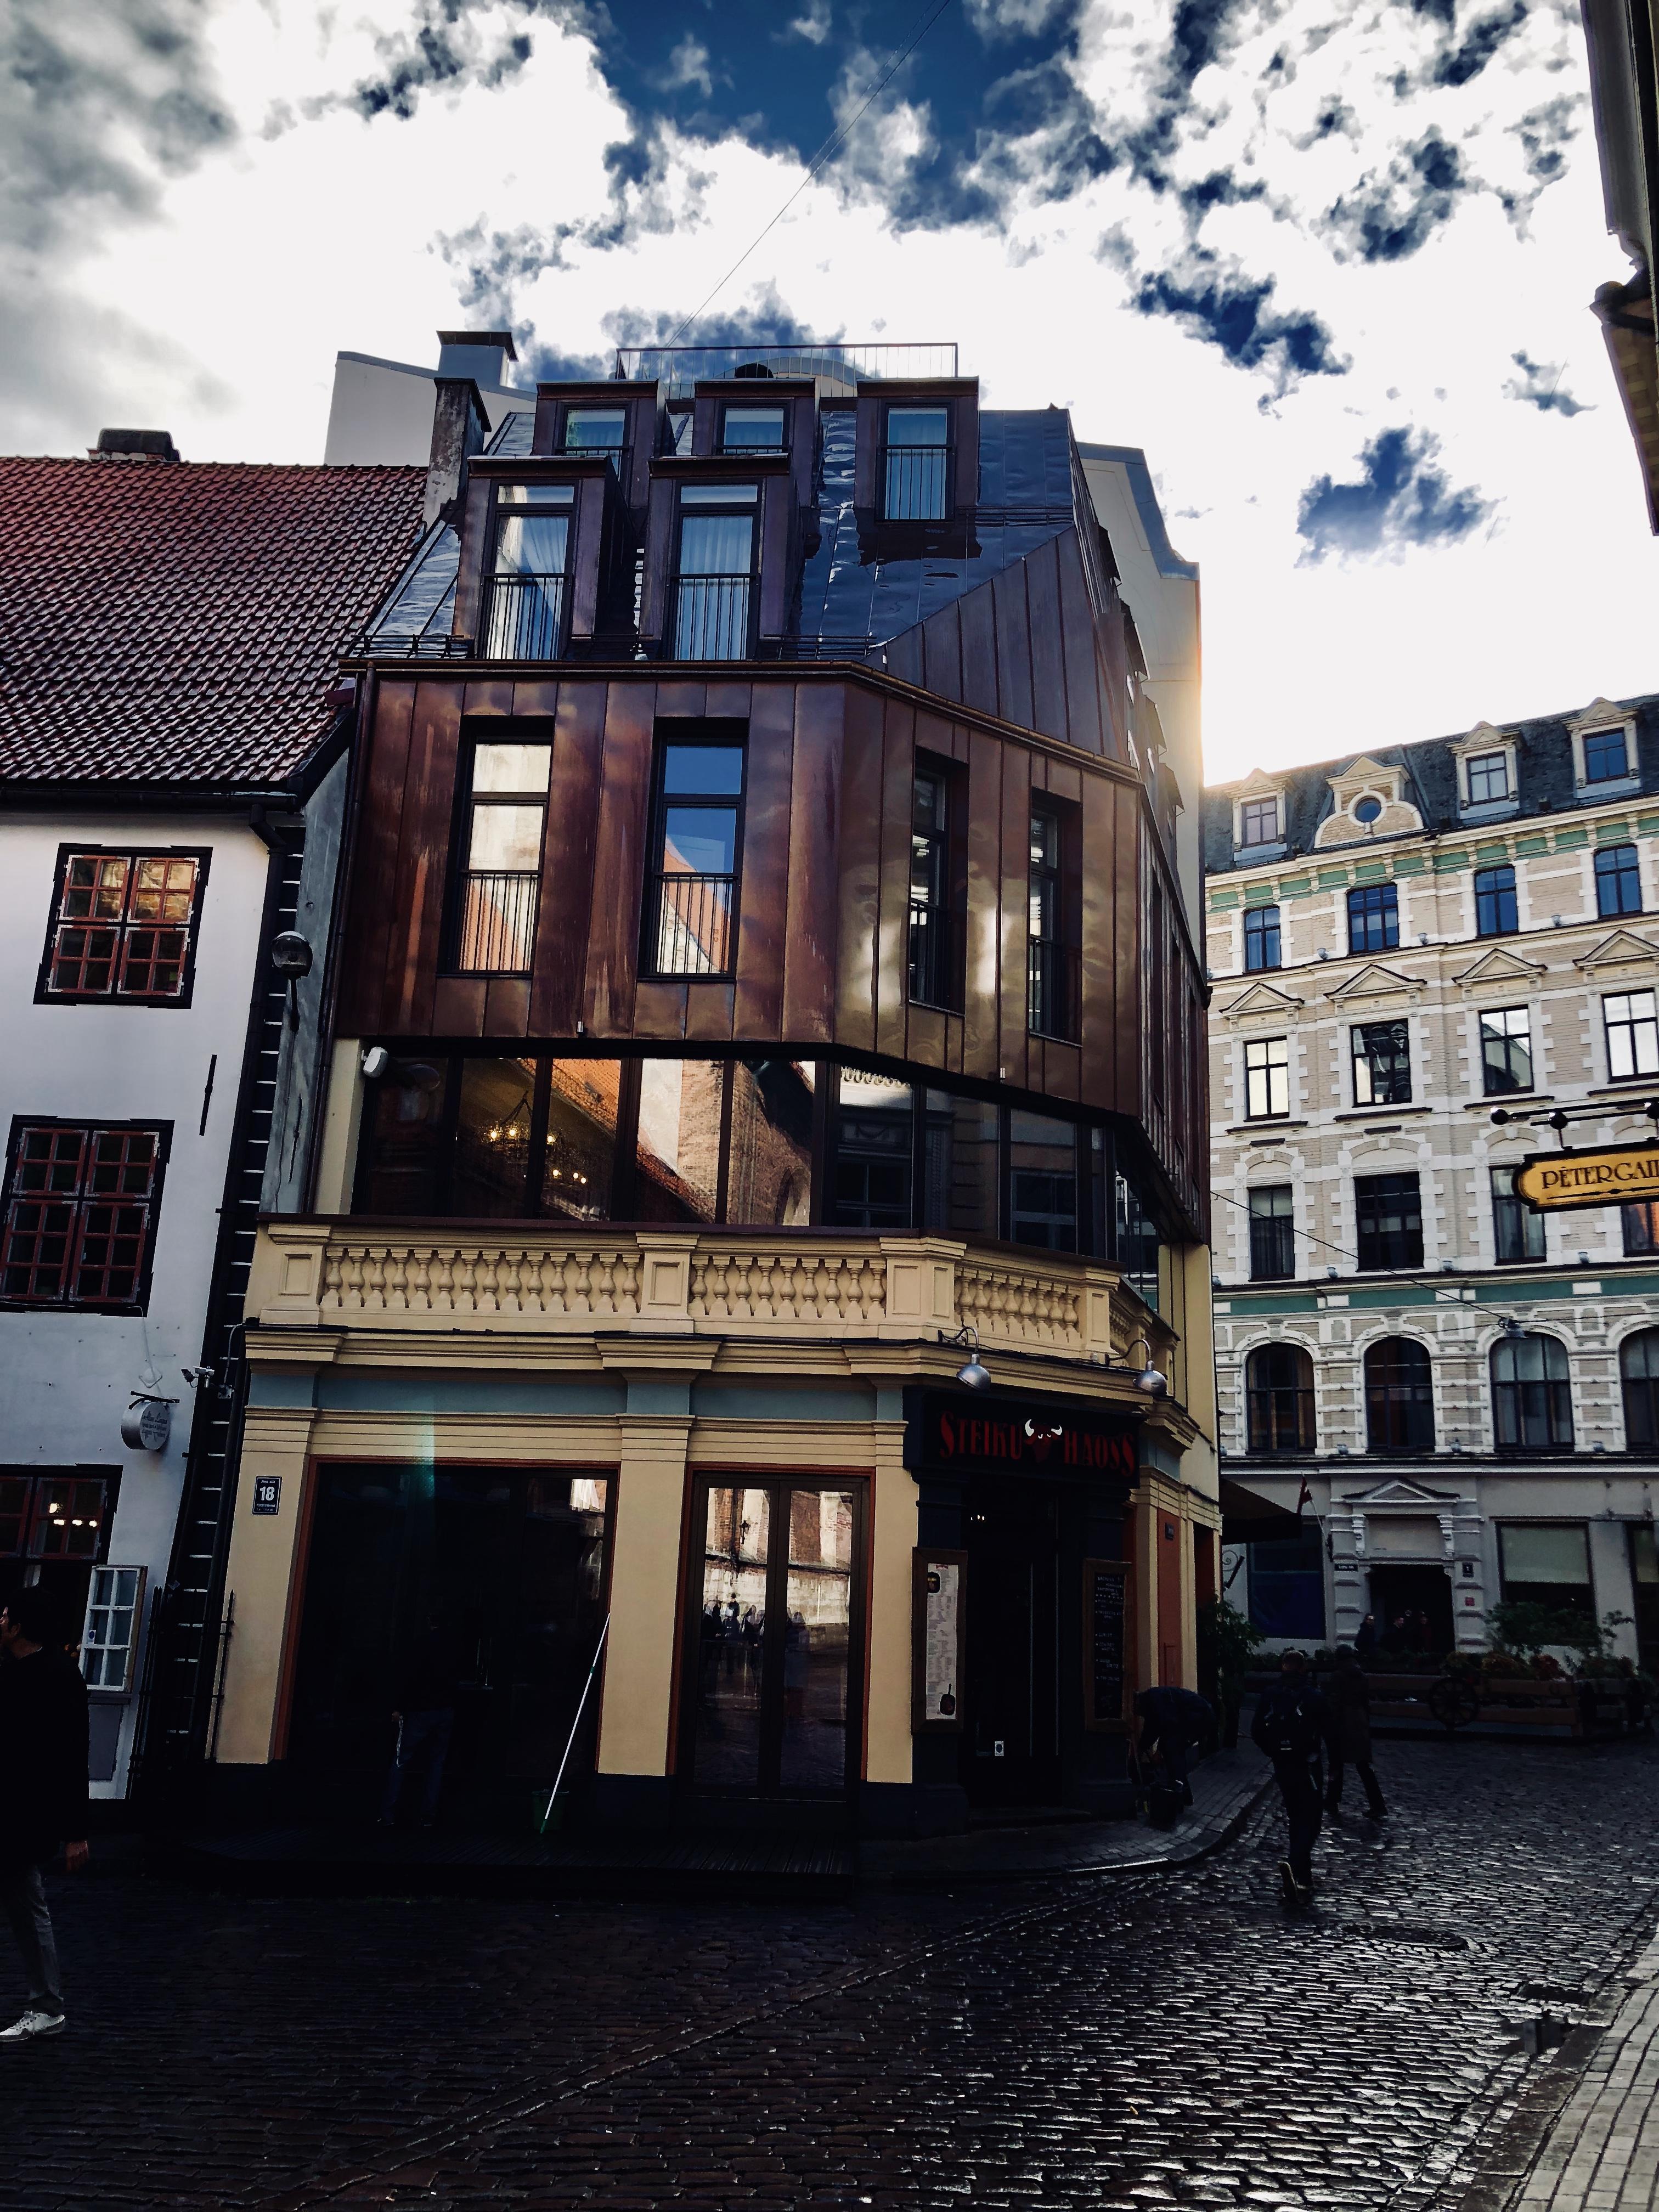 Travel Diary 24 Stunden in Riga